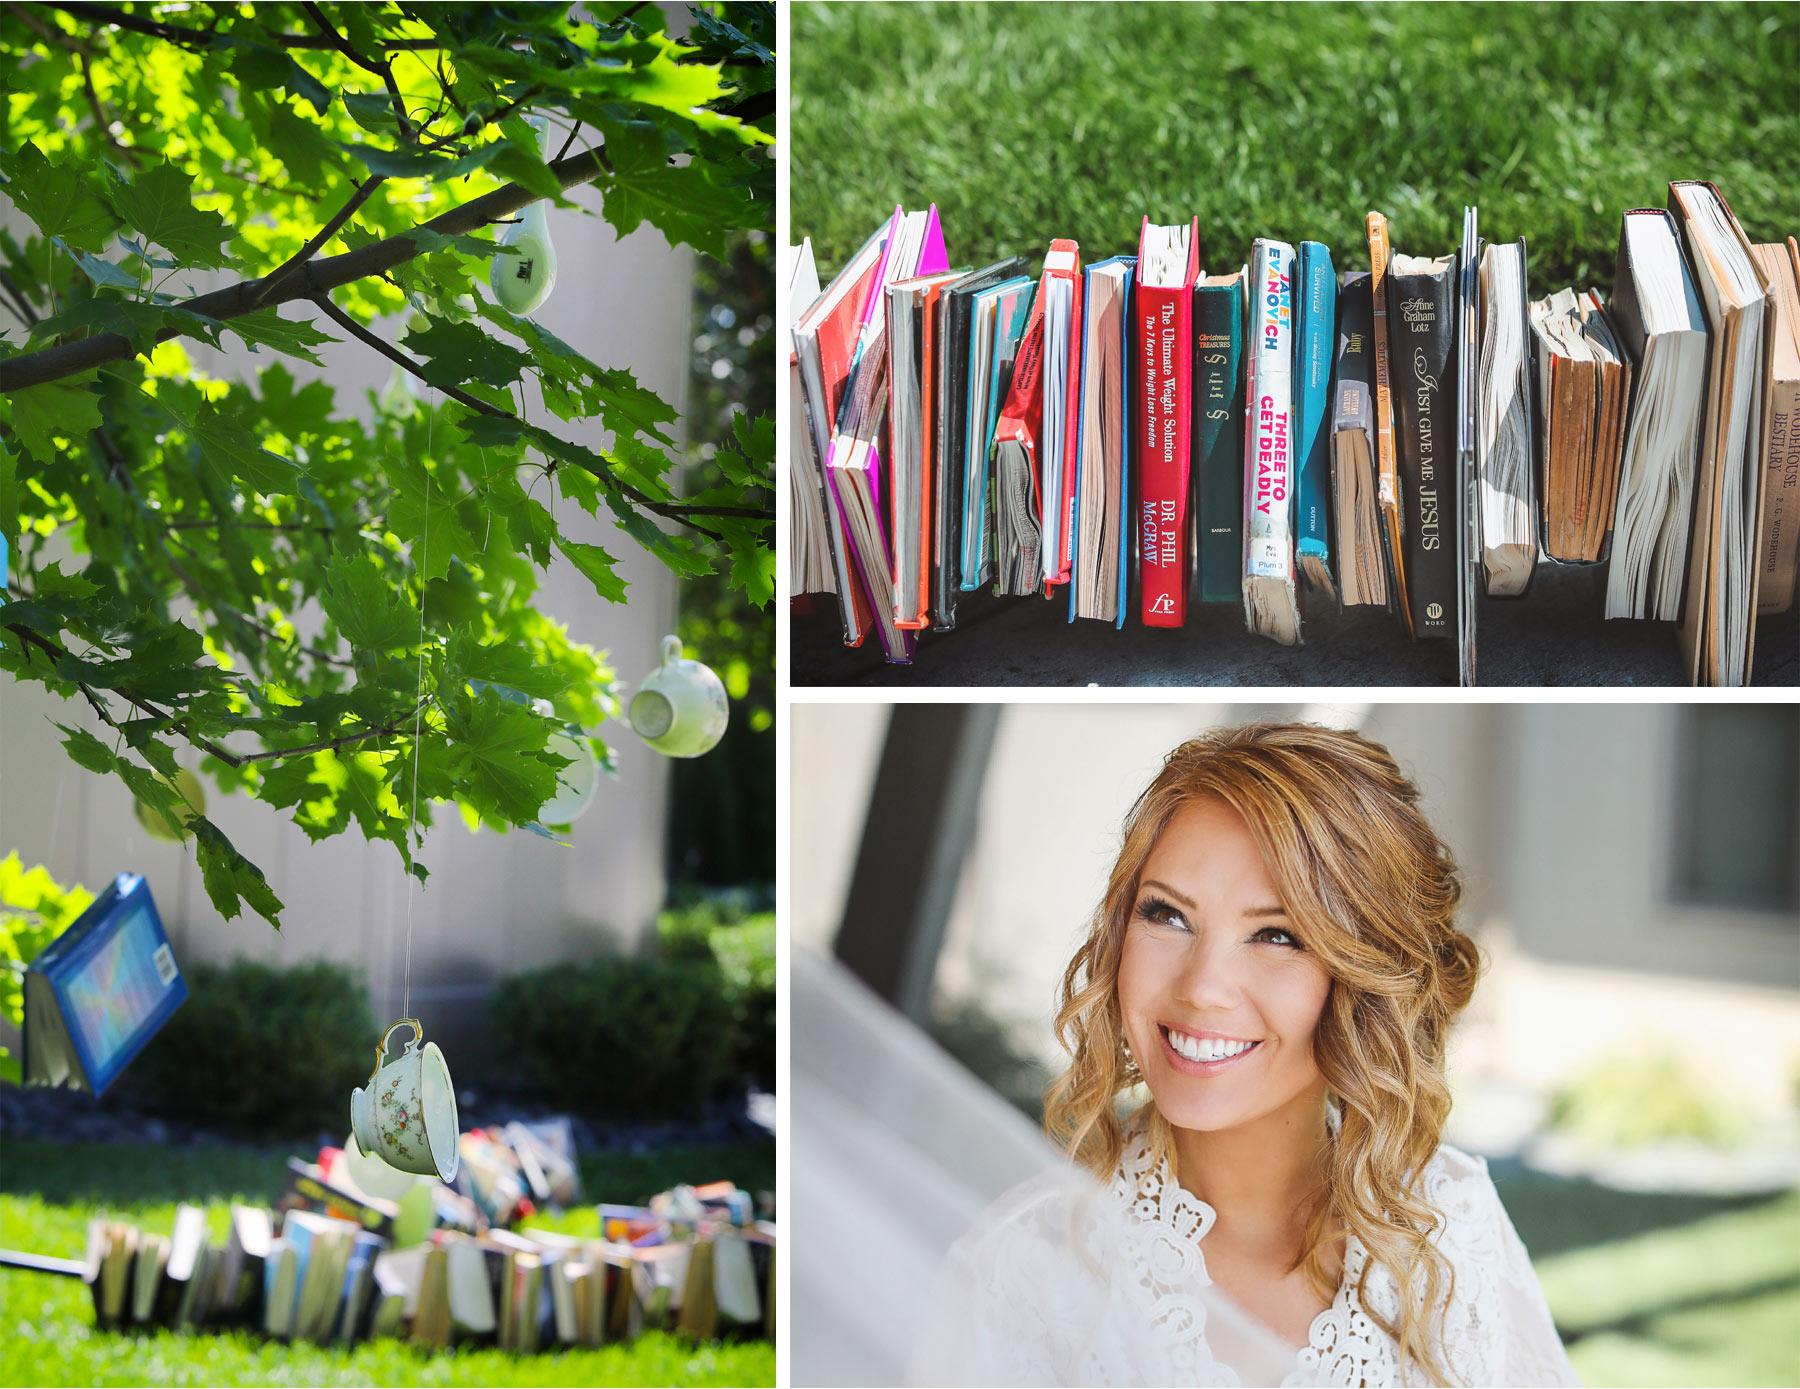 02-Vick-Photography-Wedding-Ottertail-Minnesota-Alice-in-Wonderland-Theme-Books-Bride-Teacups-Tess-and-Greg.jpg